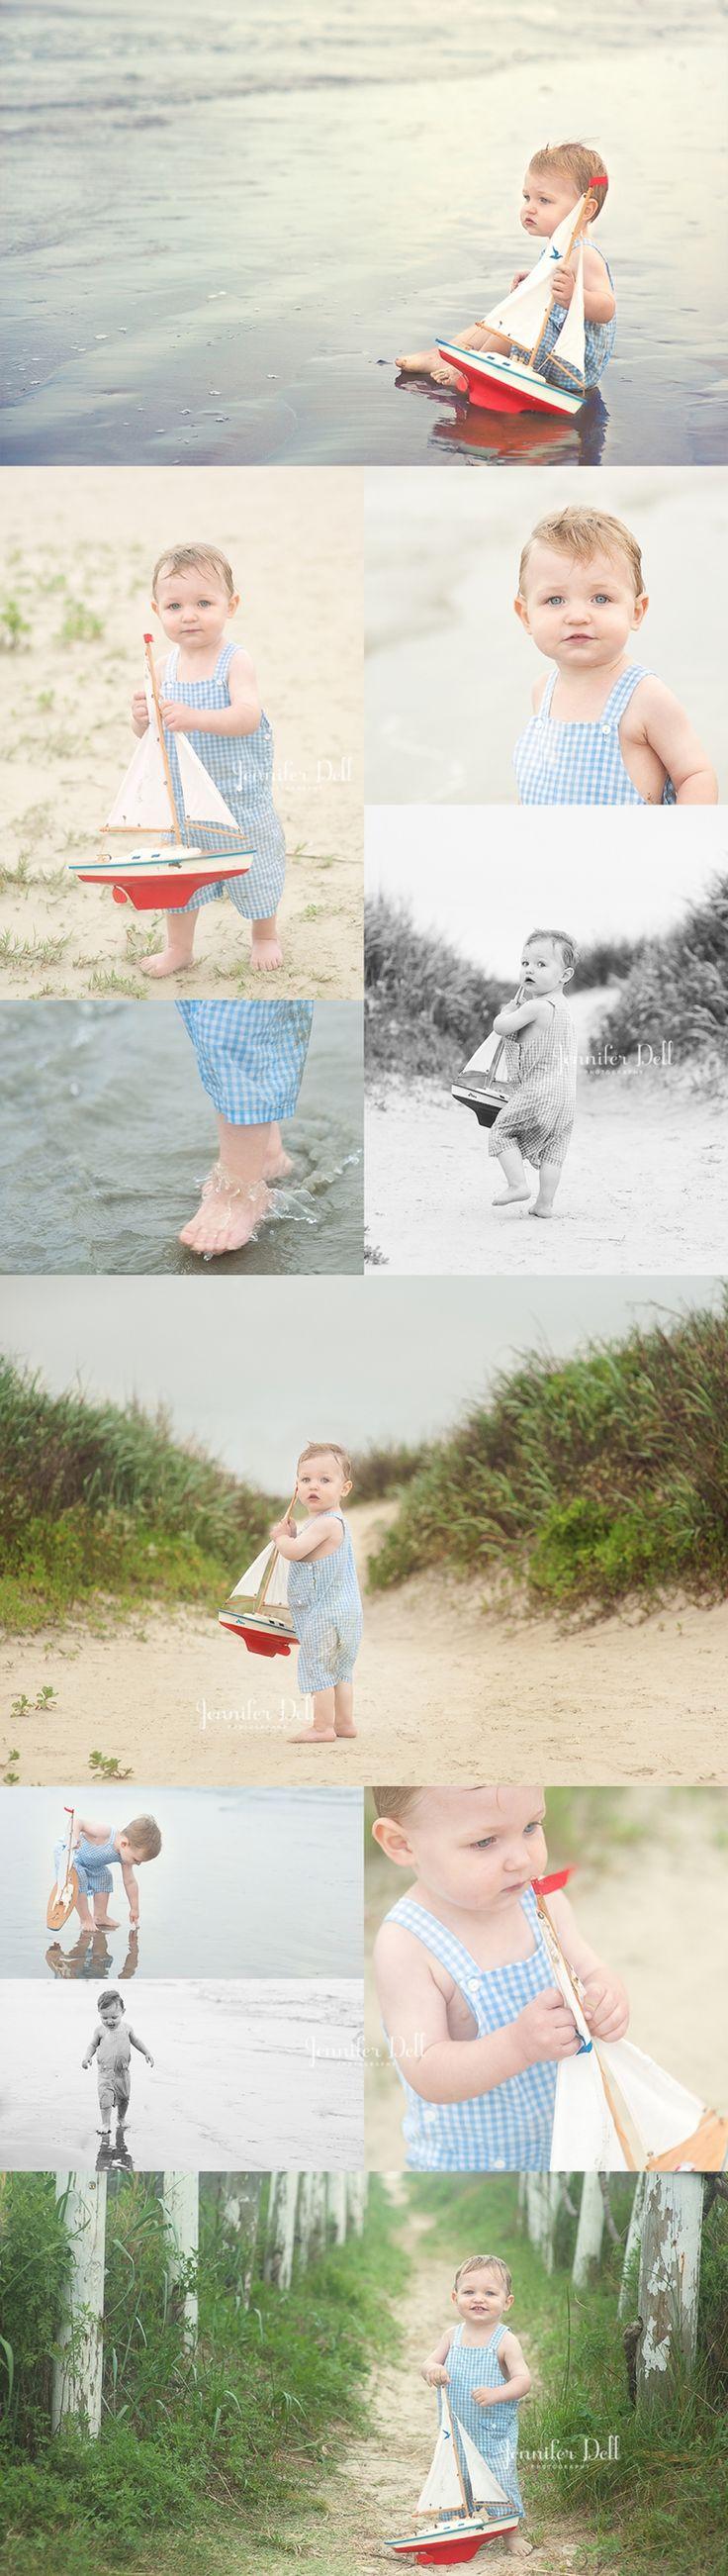 A boy, a boat and a beach